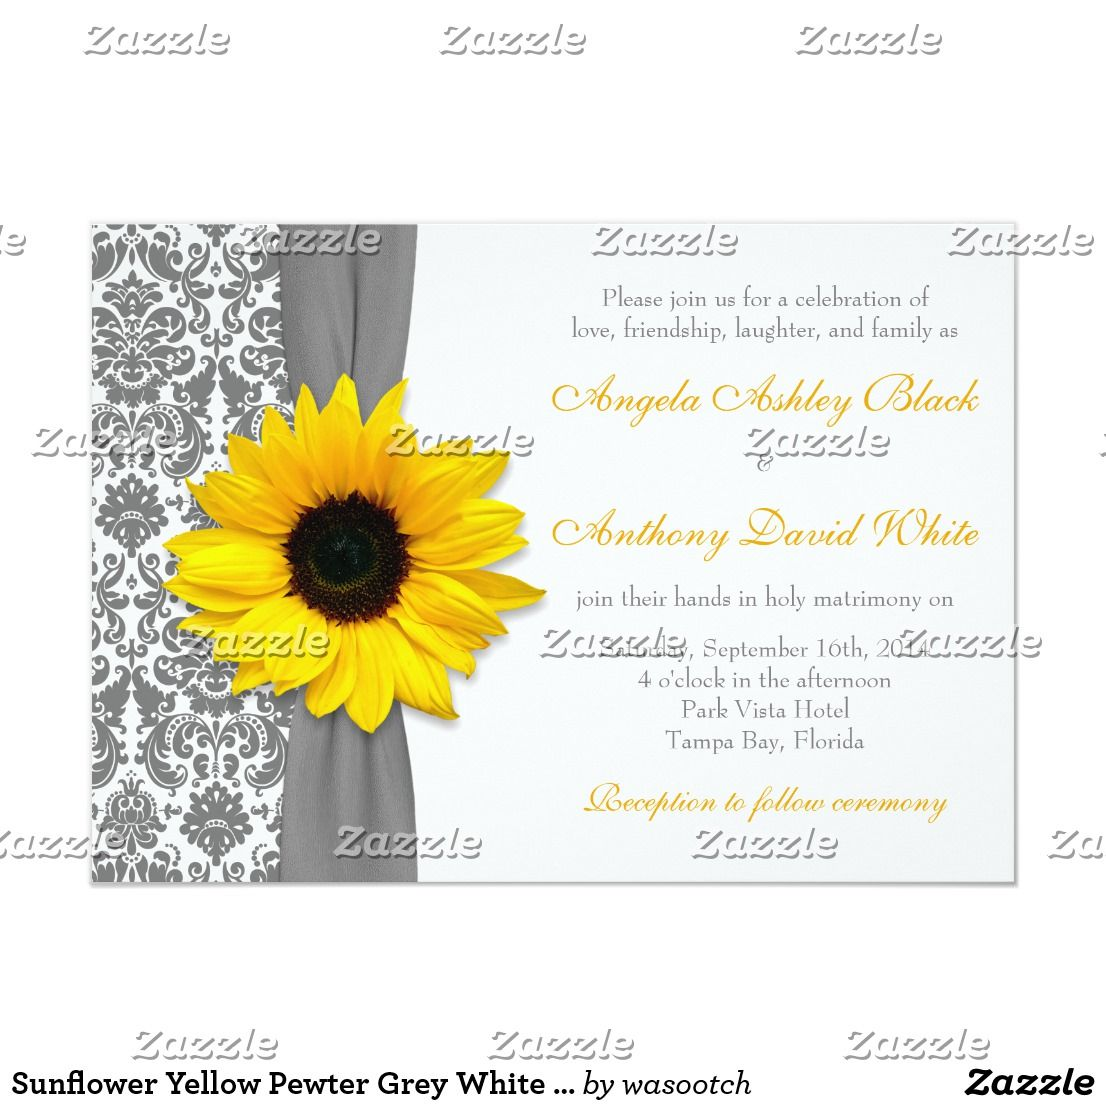 Sunflower Yellow Pewter Grey White Damask Wedding